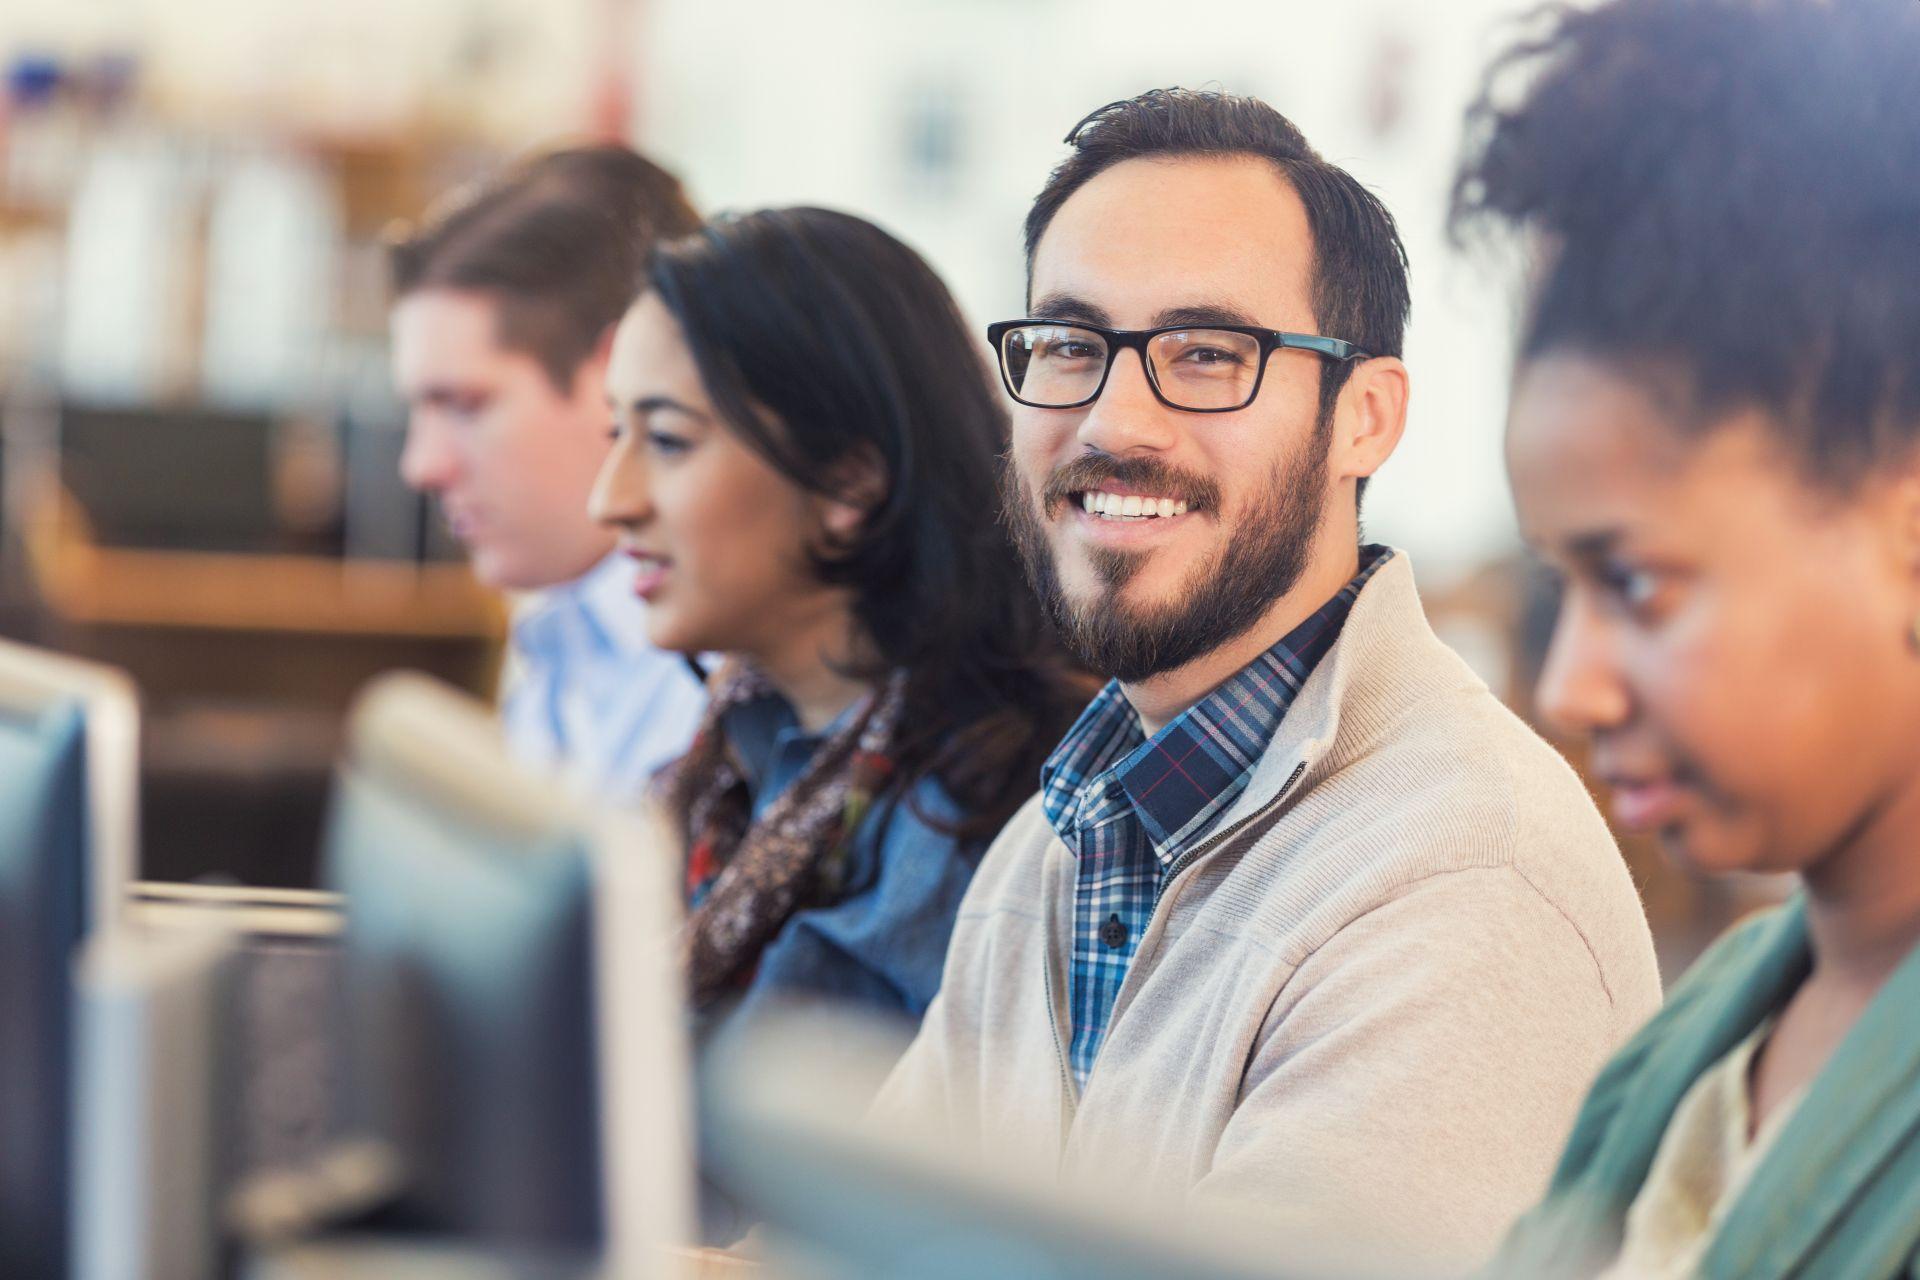 Introduction to Essential Digital Skills